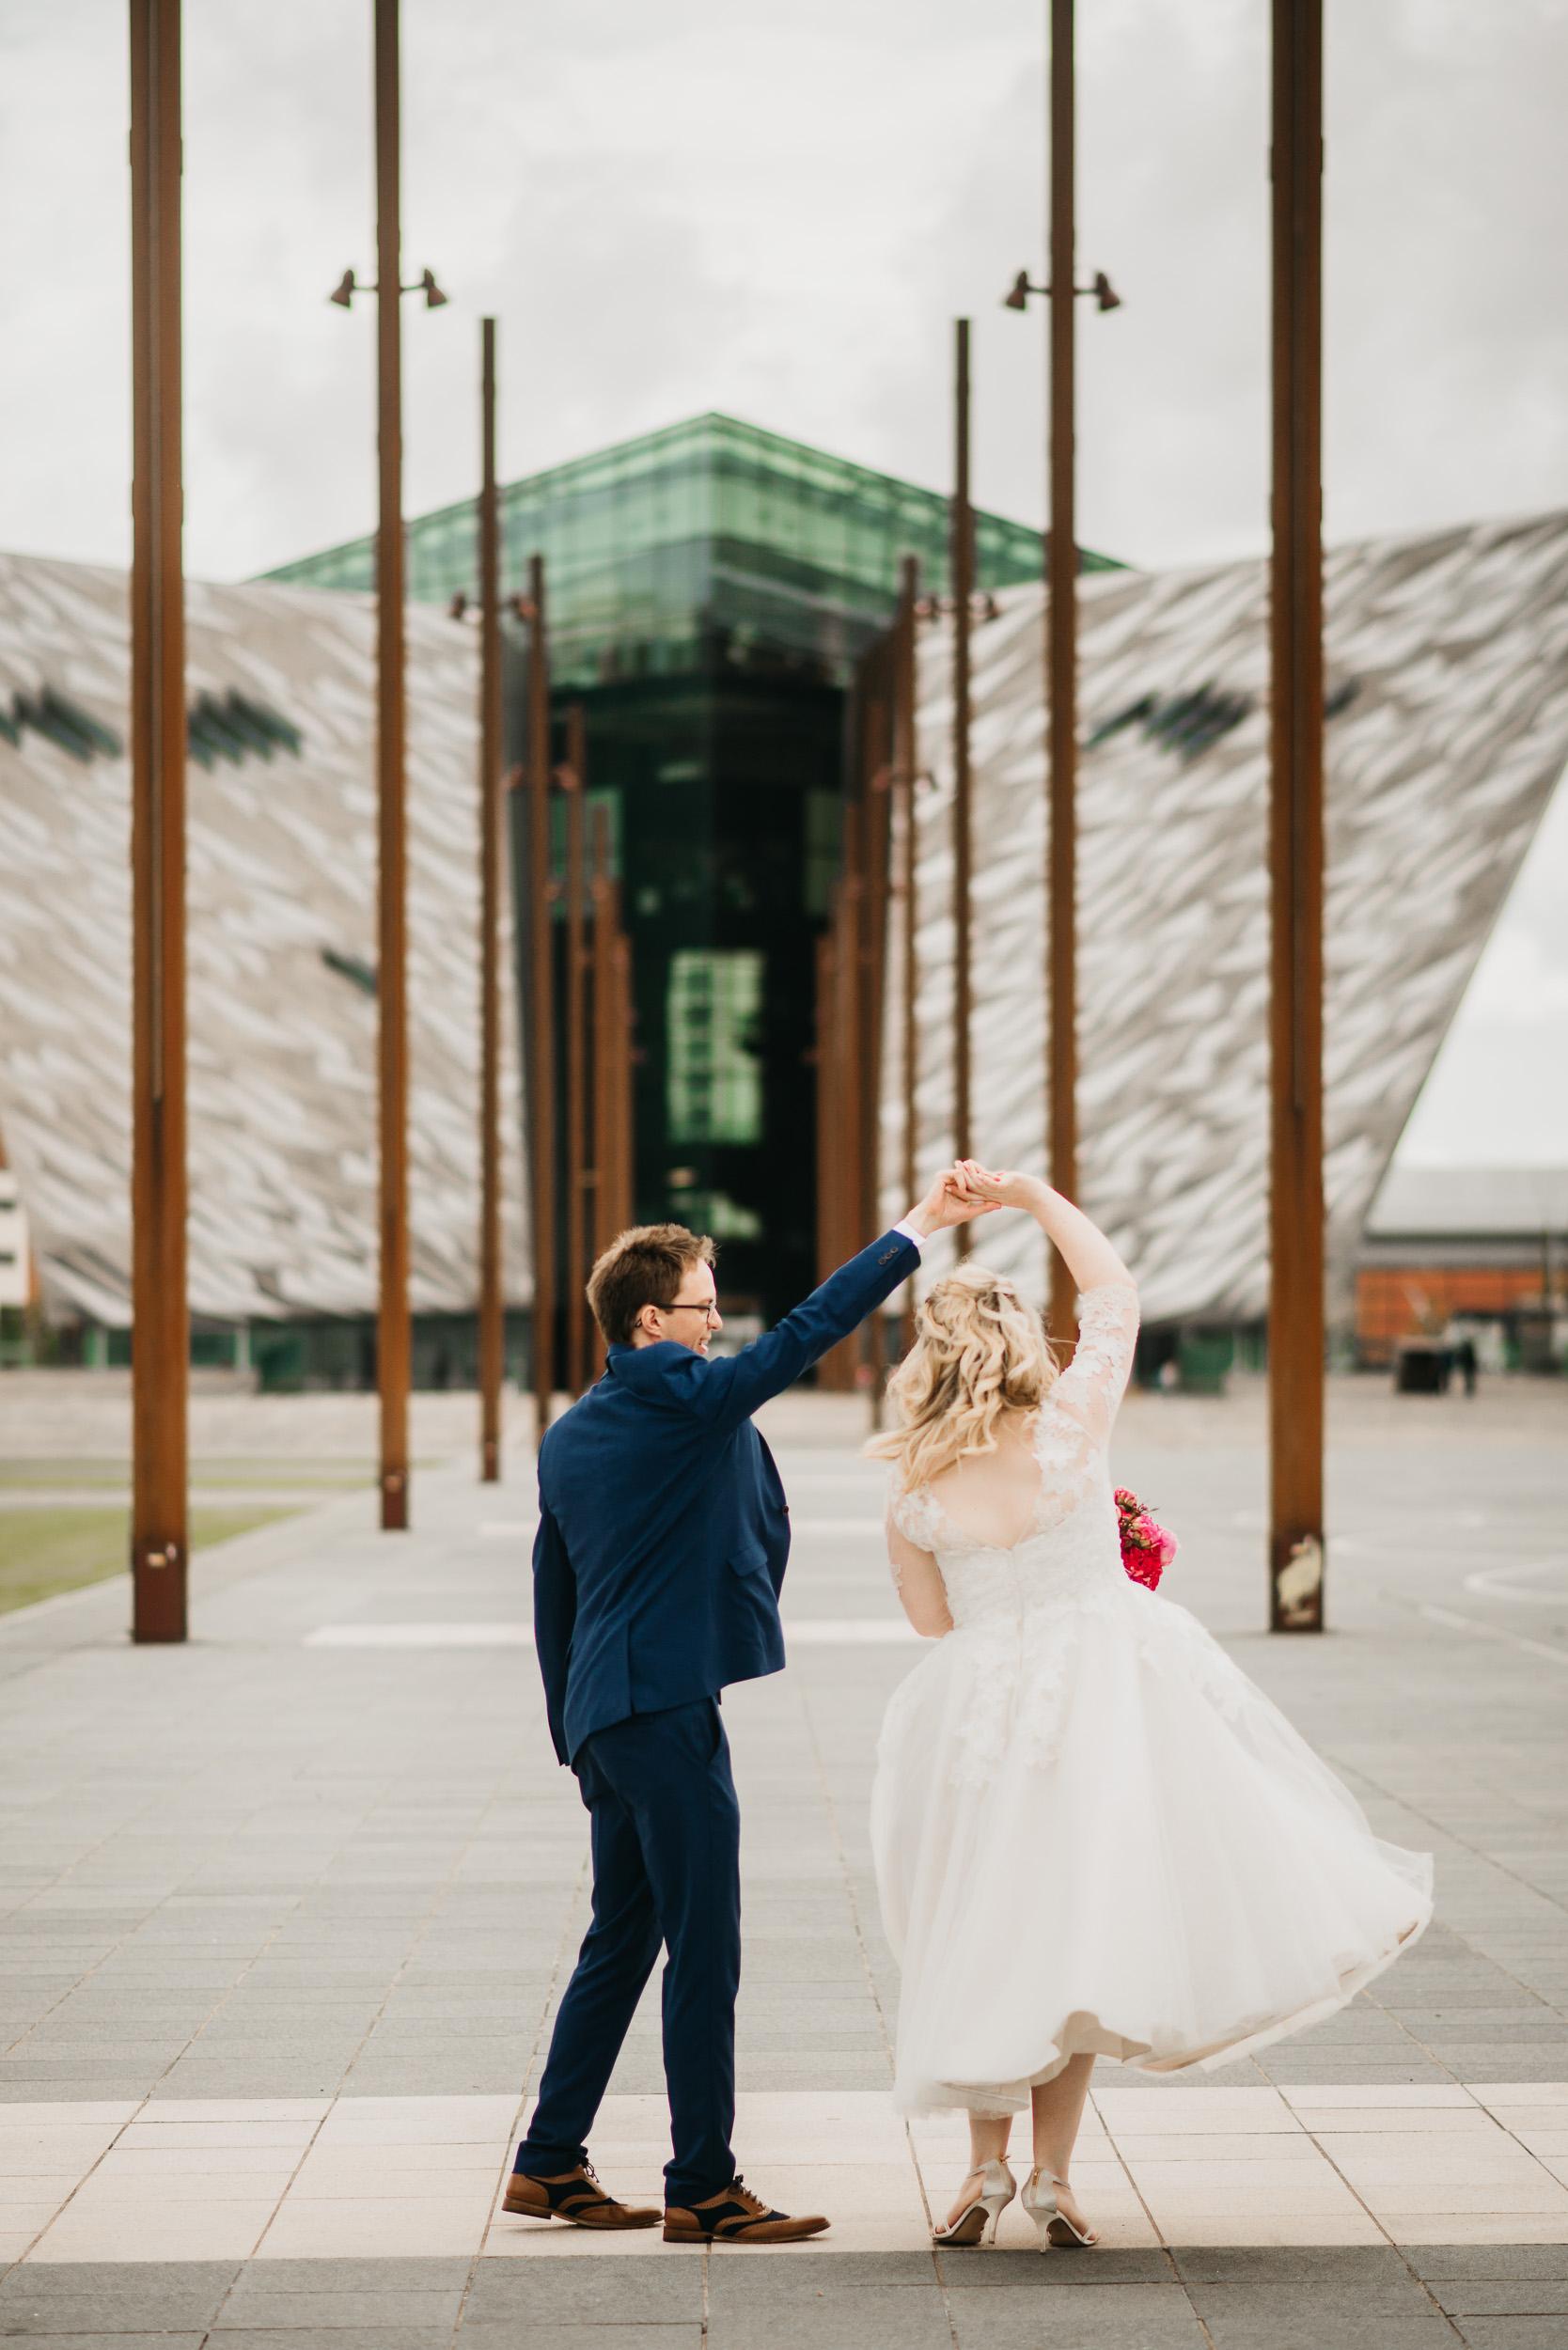 wedding photogaphy peter mackey 2018 h-1-2.jpg